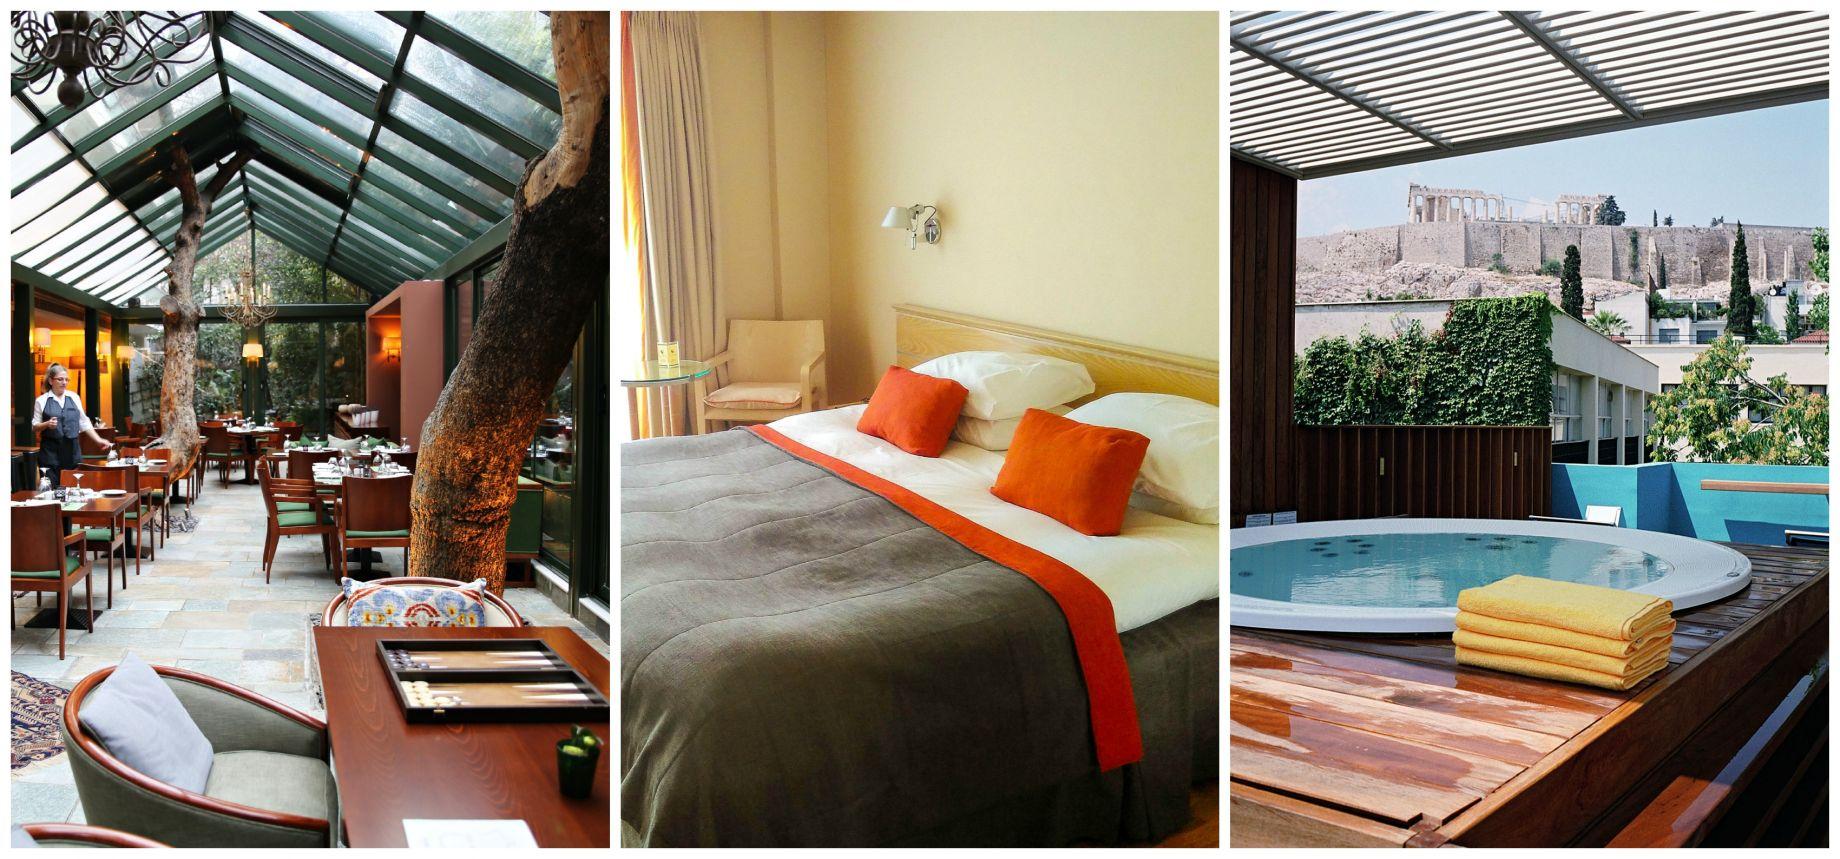 Herodion Hotel Lobby Bedroom and Jacuzzi Atrium